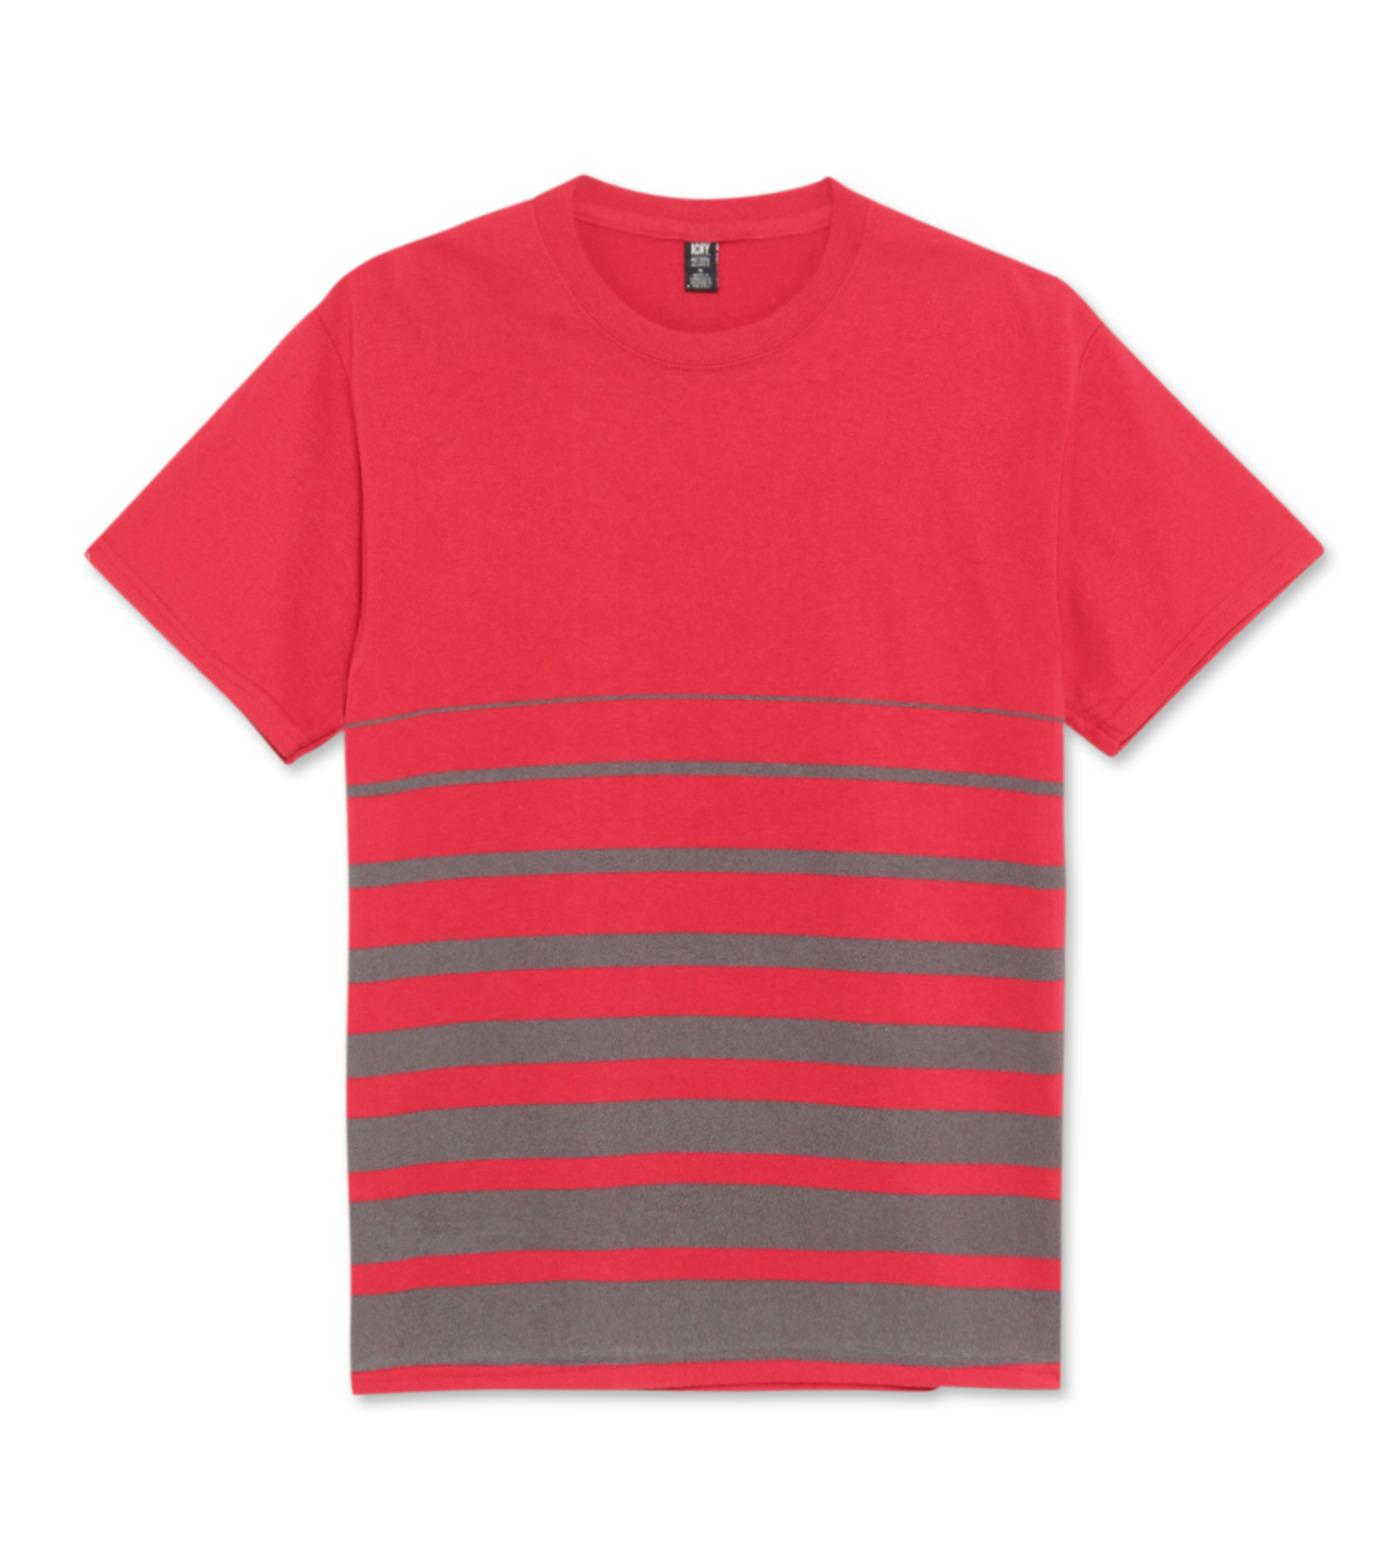 ICNY(アイ・シー・エヌ・ワイ)のGradient T-shirts-RED(T-SHIRTS/T-SHIRTS)-GRDT-62 拡大詳細画像1